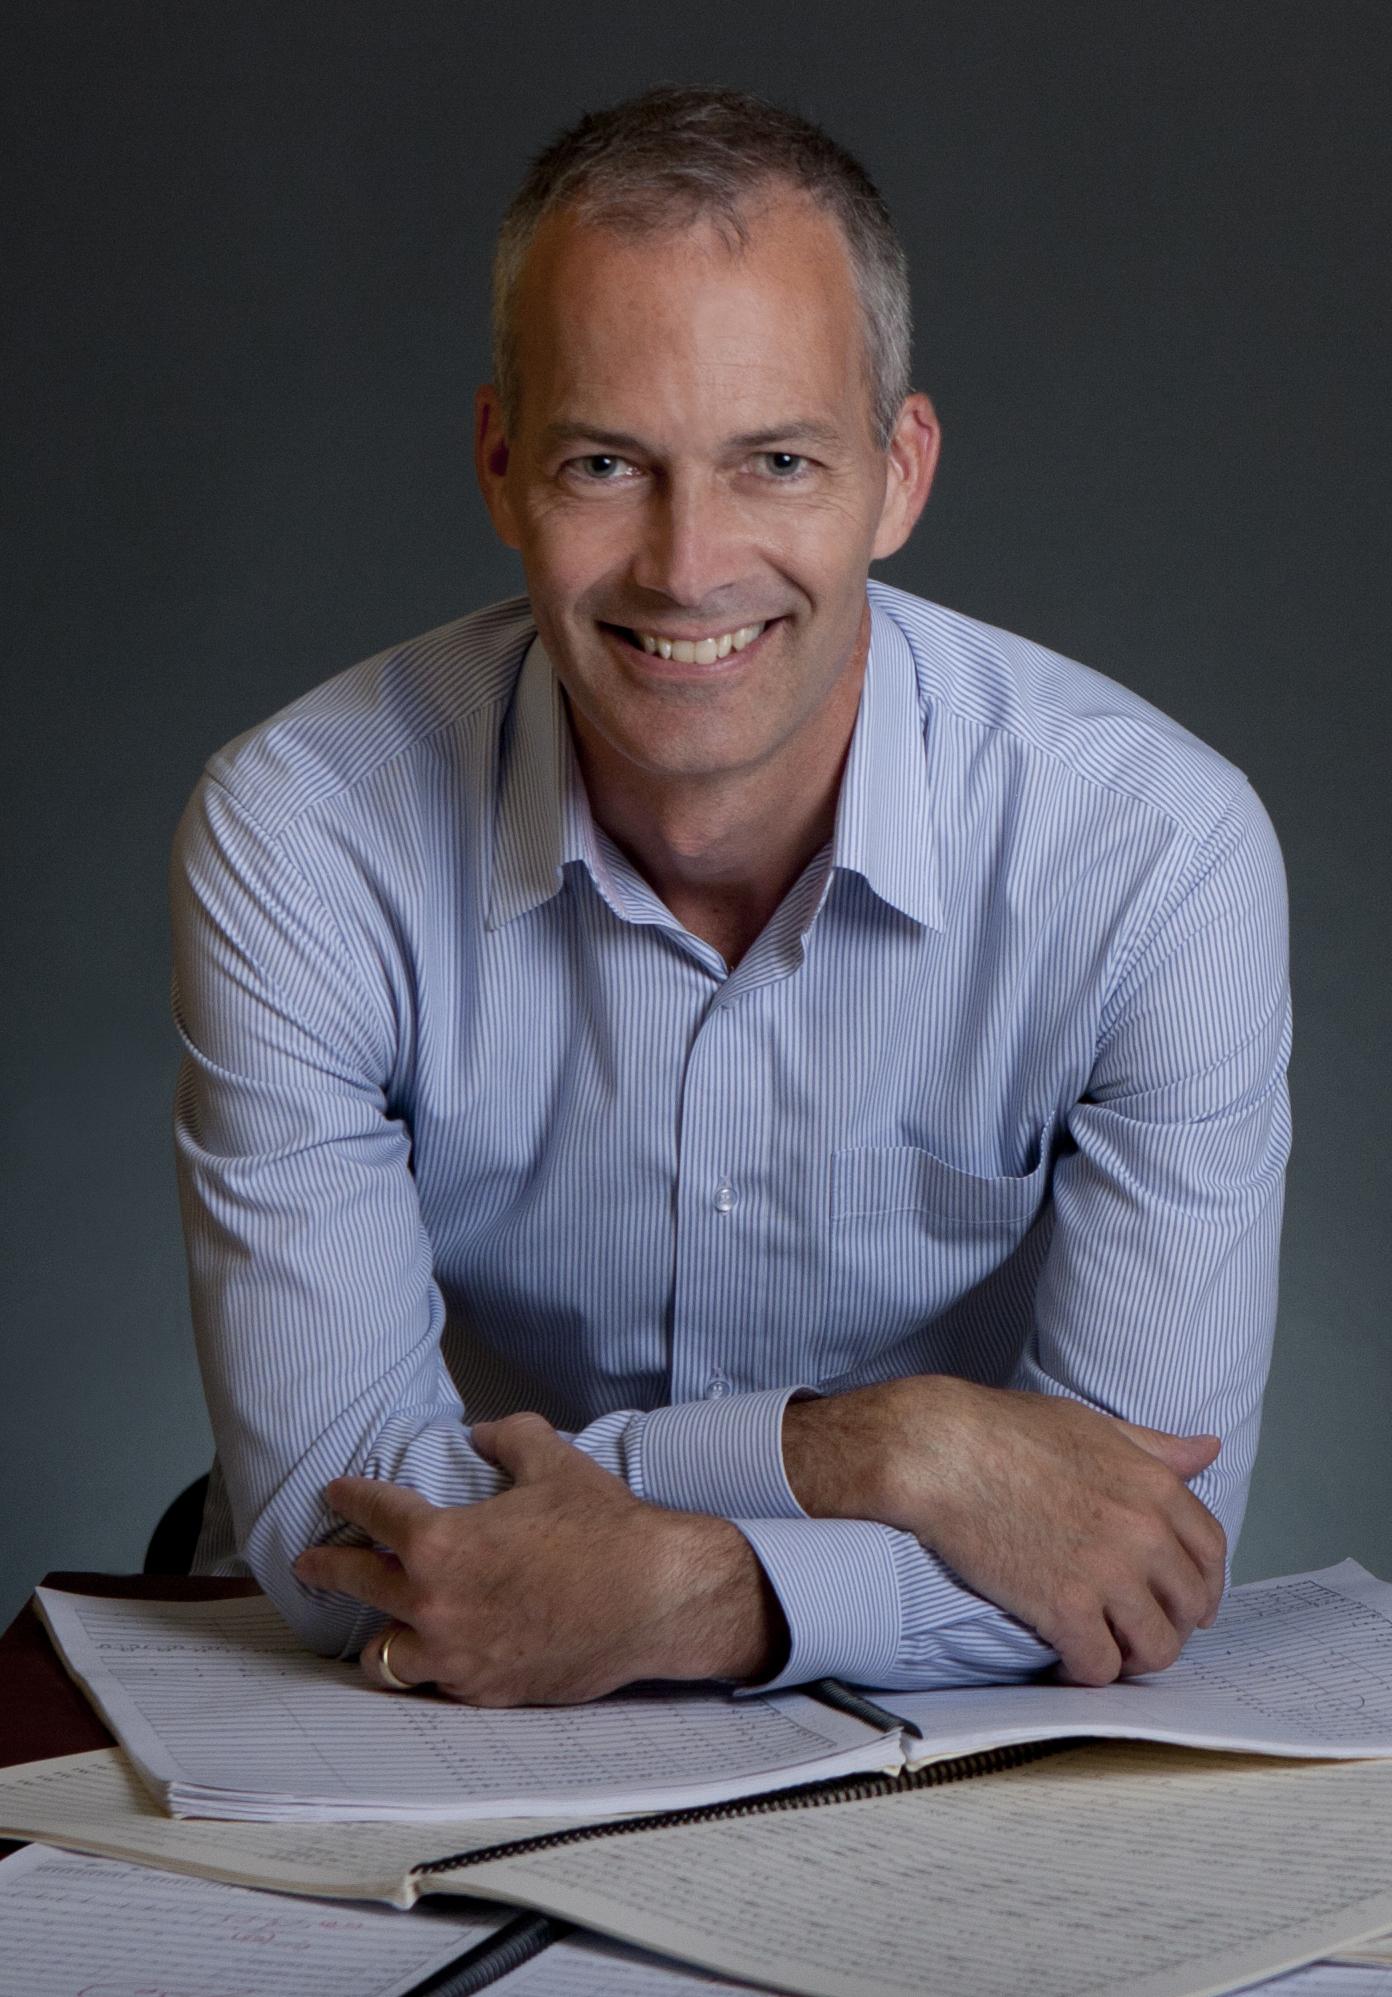 Jim Stephenson